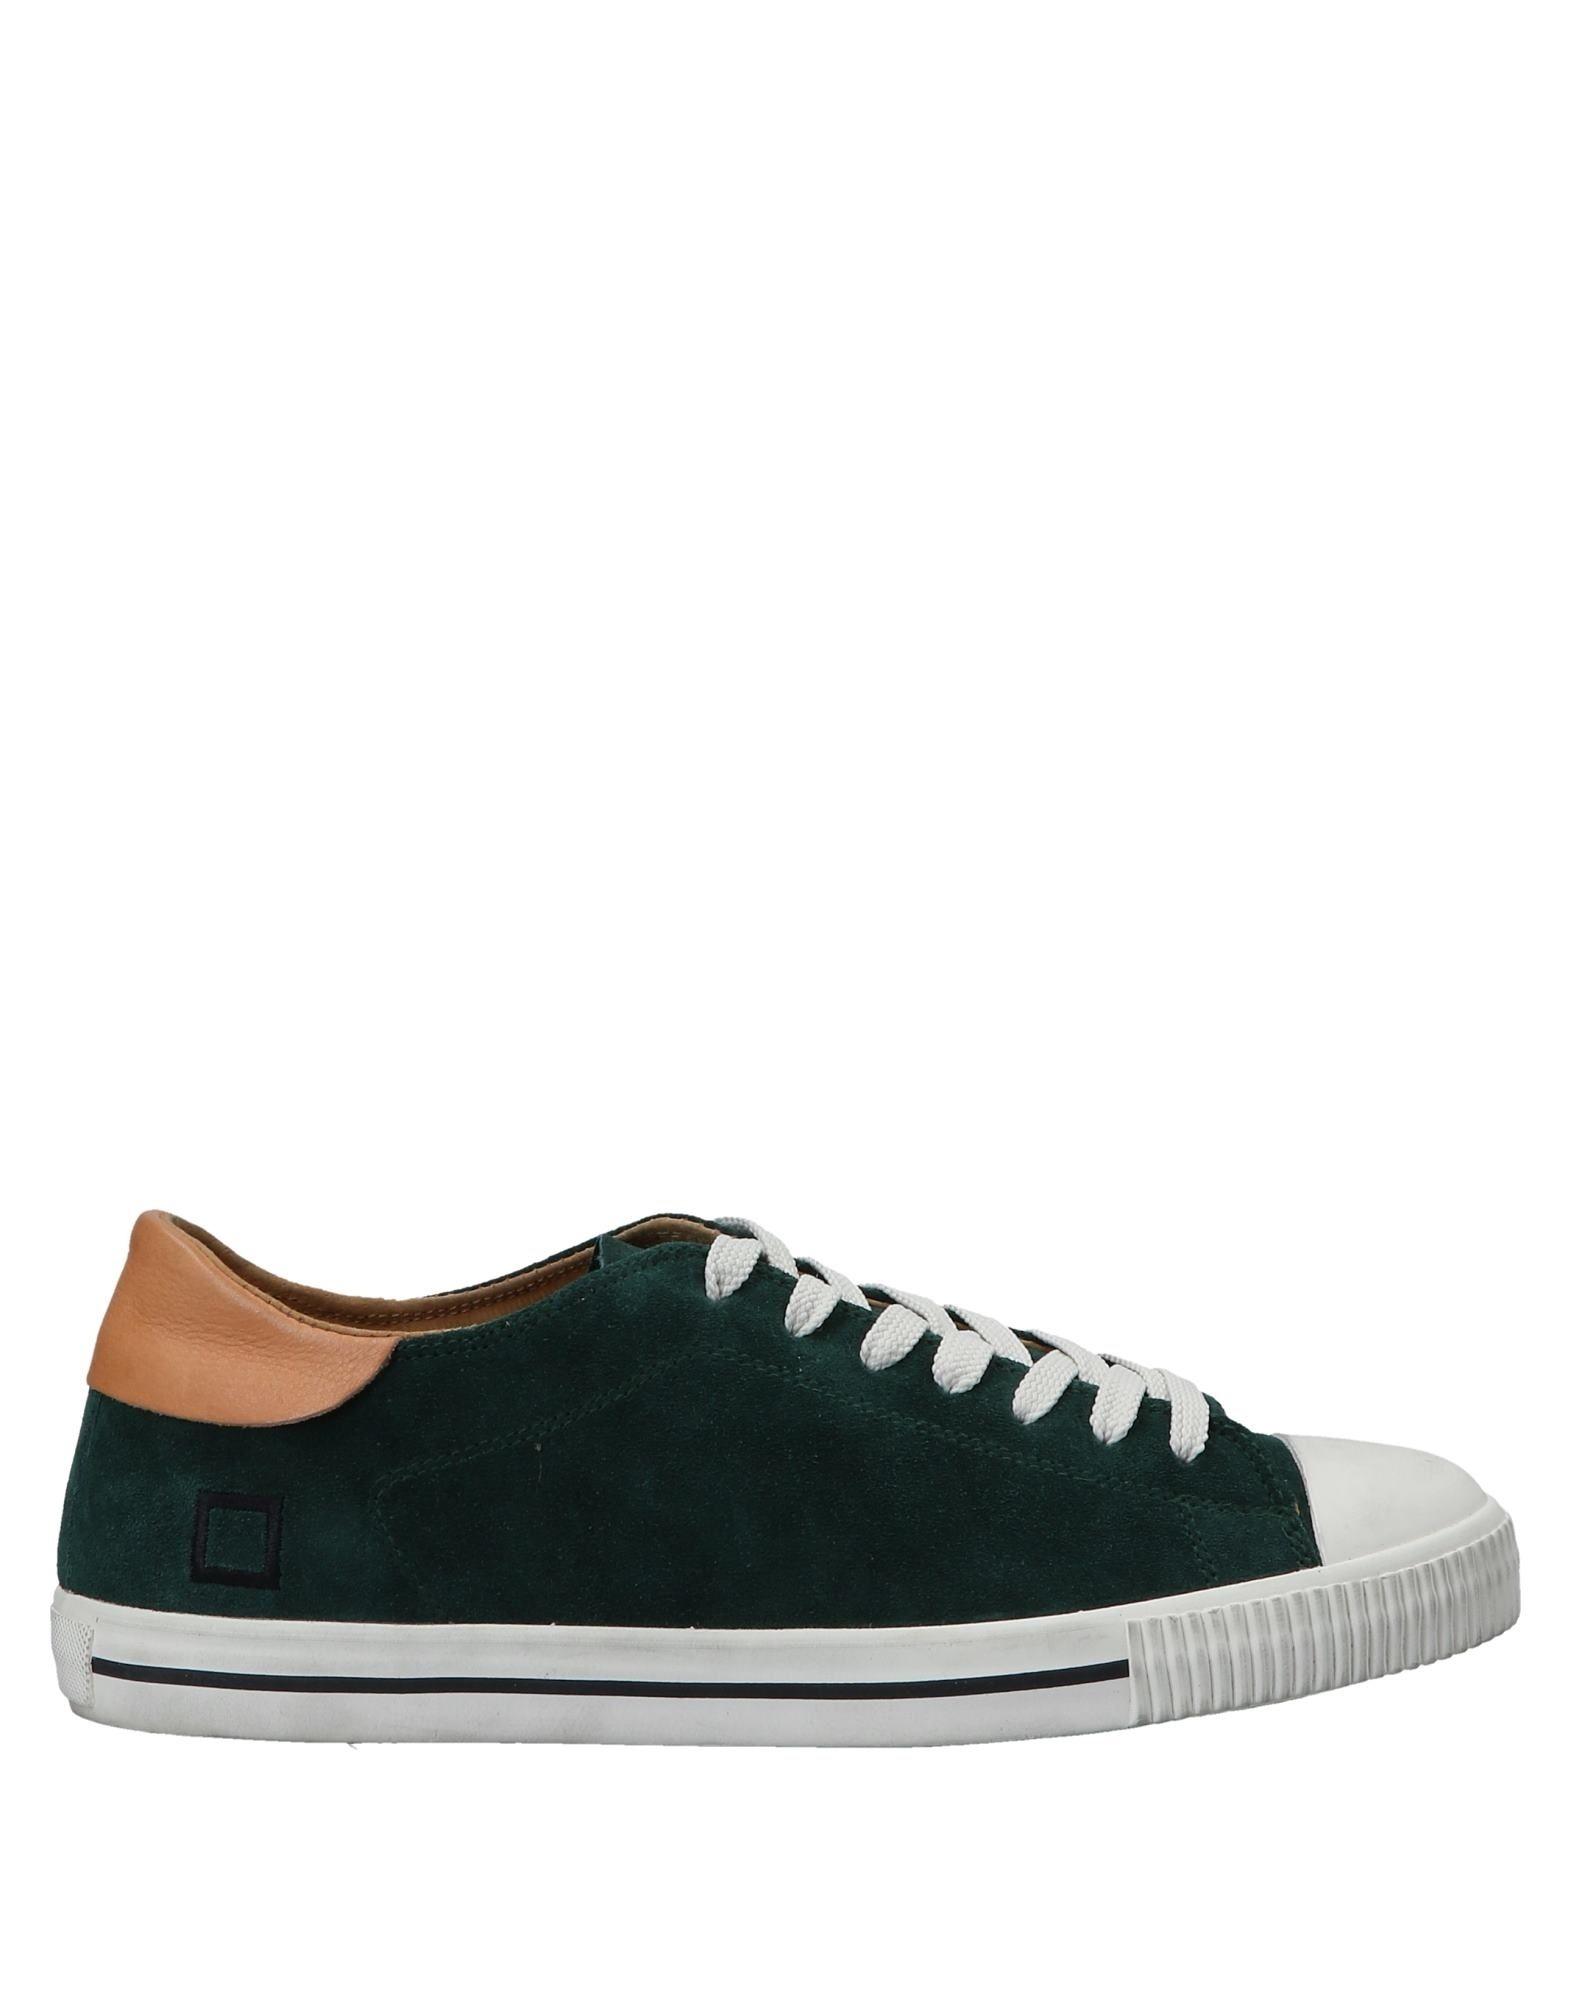 D.A.T.E.  Sneakers - Men D.A.T.E. Sneakers online on  D.A.T.E. United Kingdom - 11547030VU f0202a